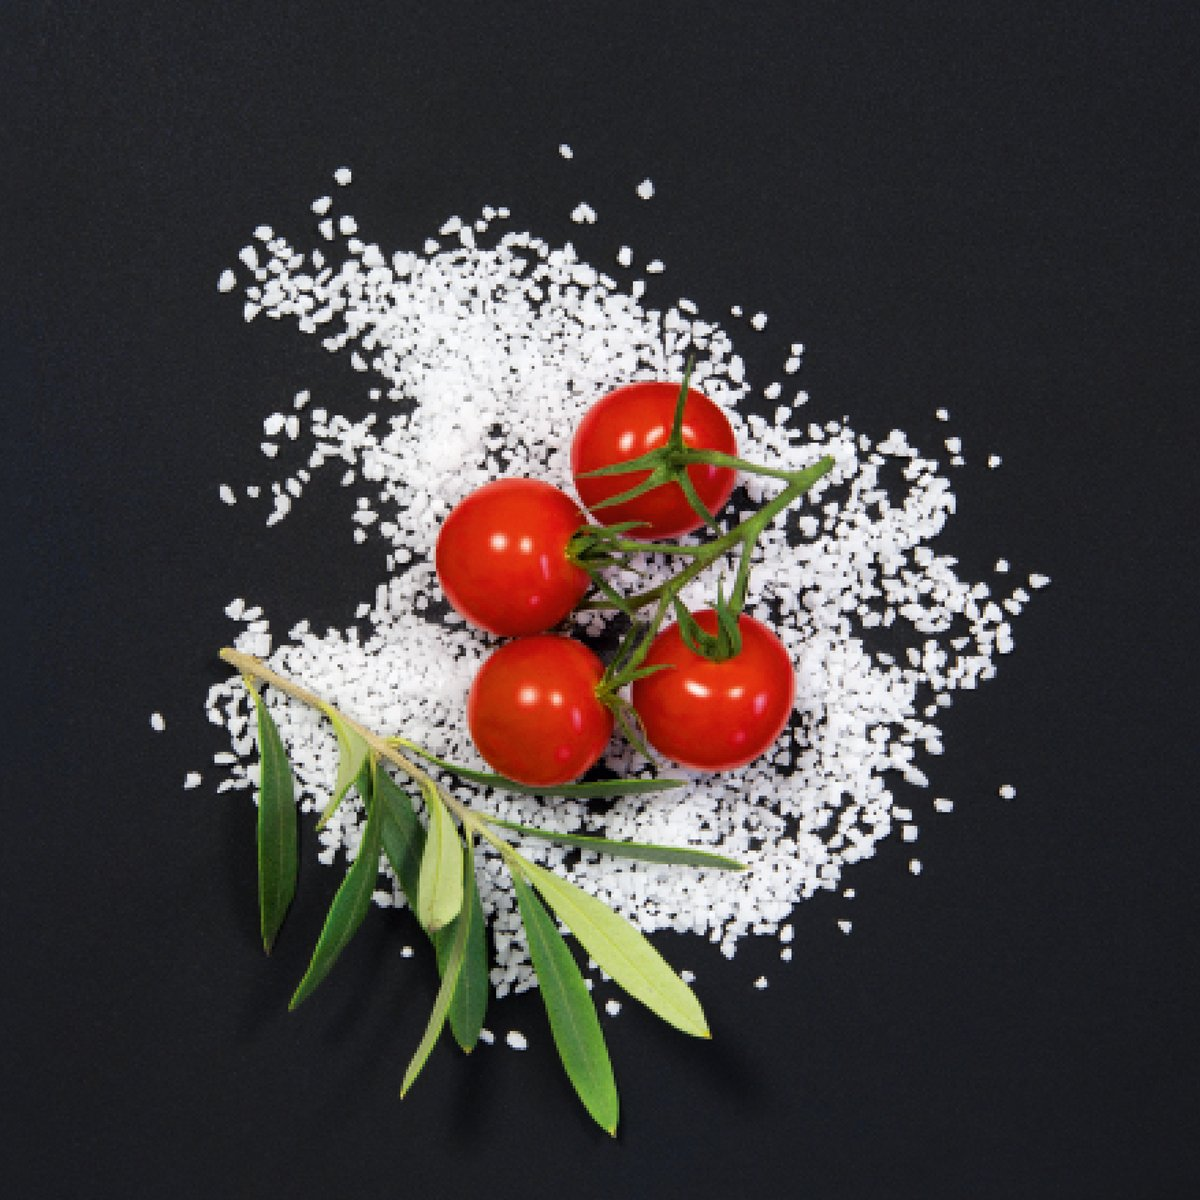 Eurographics 200x200, Cucina Italiana Pomodori Deco Glass, Black, 200 x 200 cm,  200 x 20 x 200 cm